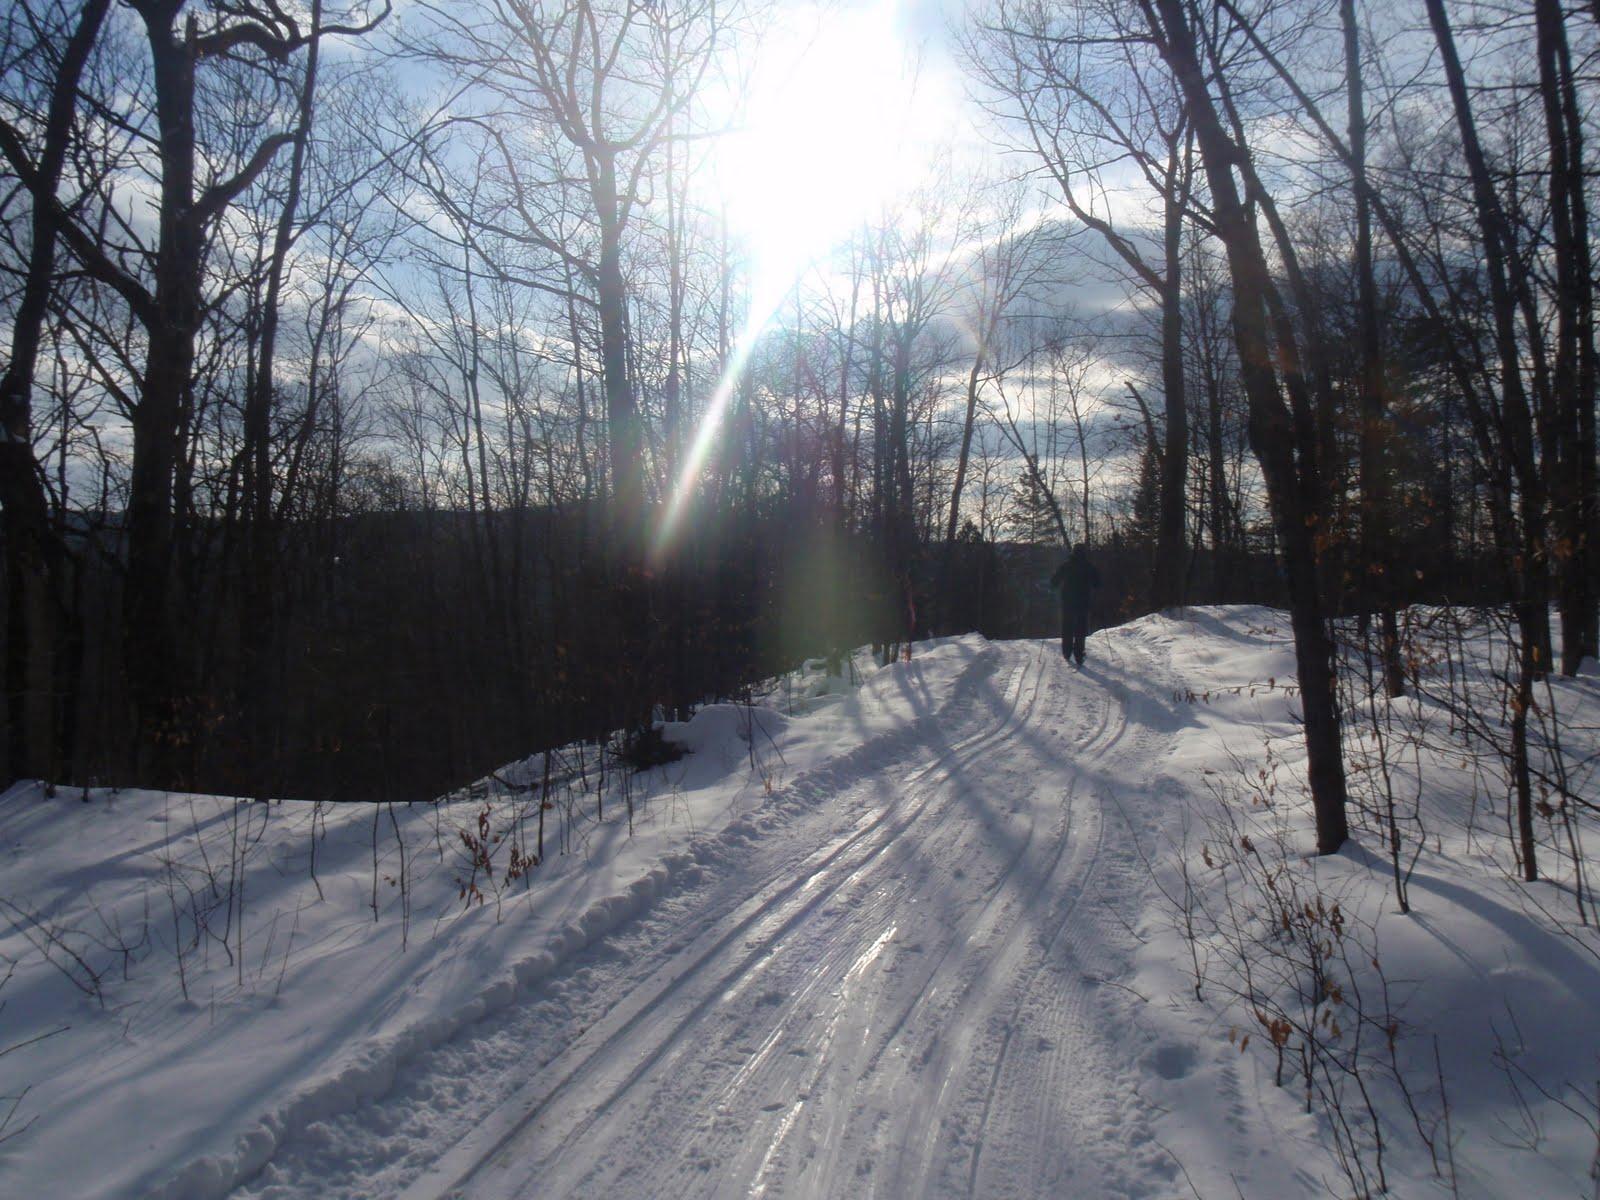 Chaise pliante ski de fond la montagne coup e - Montagne coupee ski de fond ...